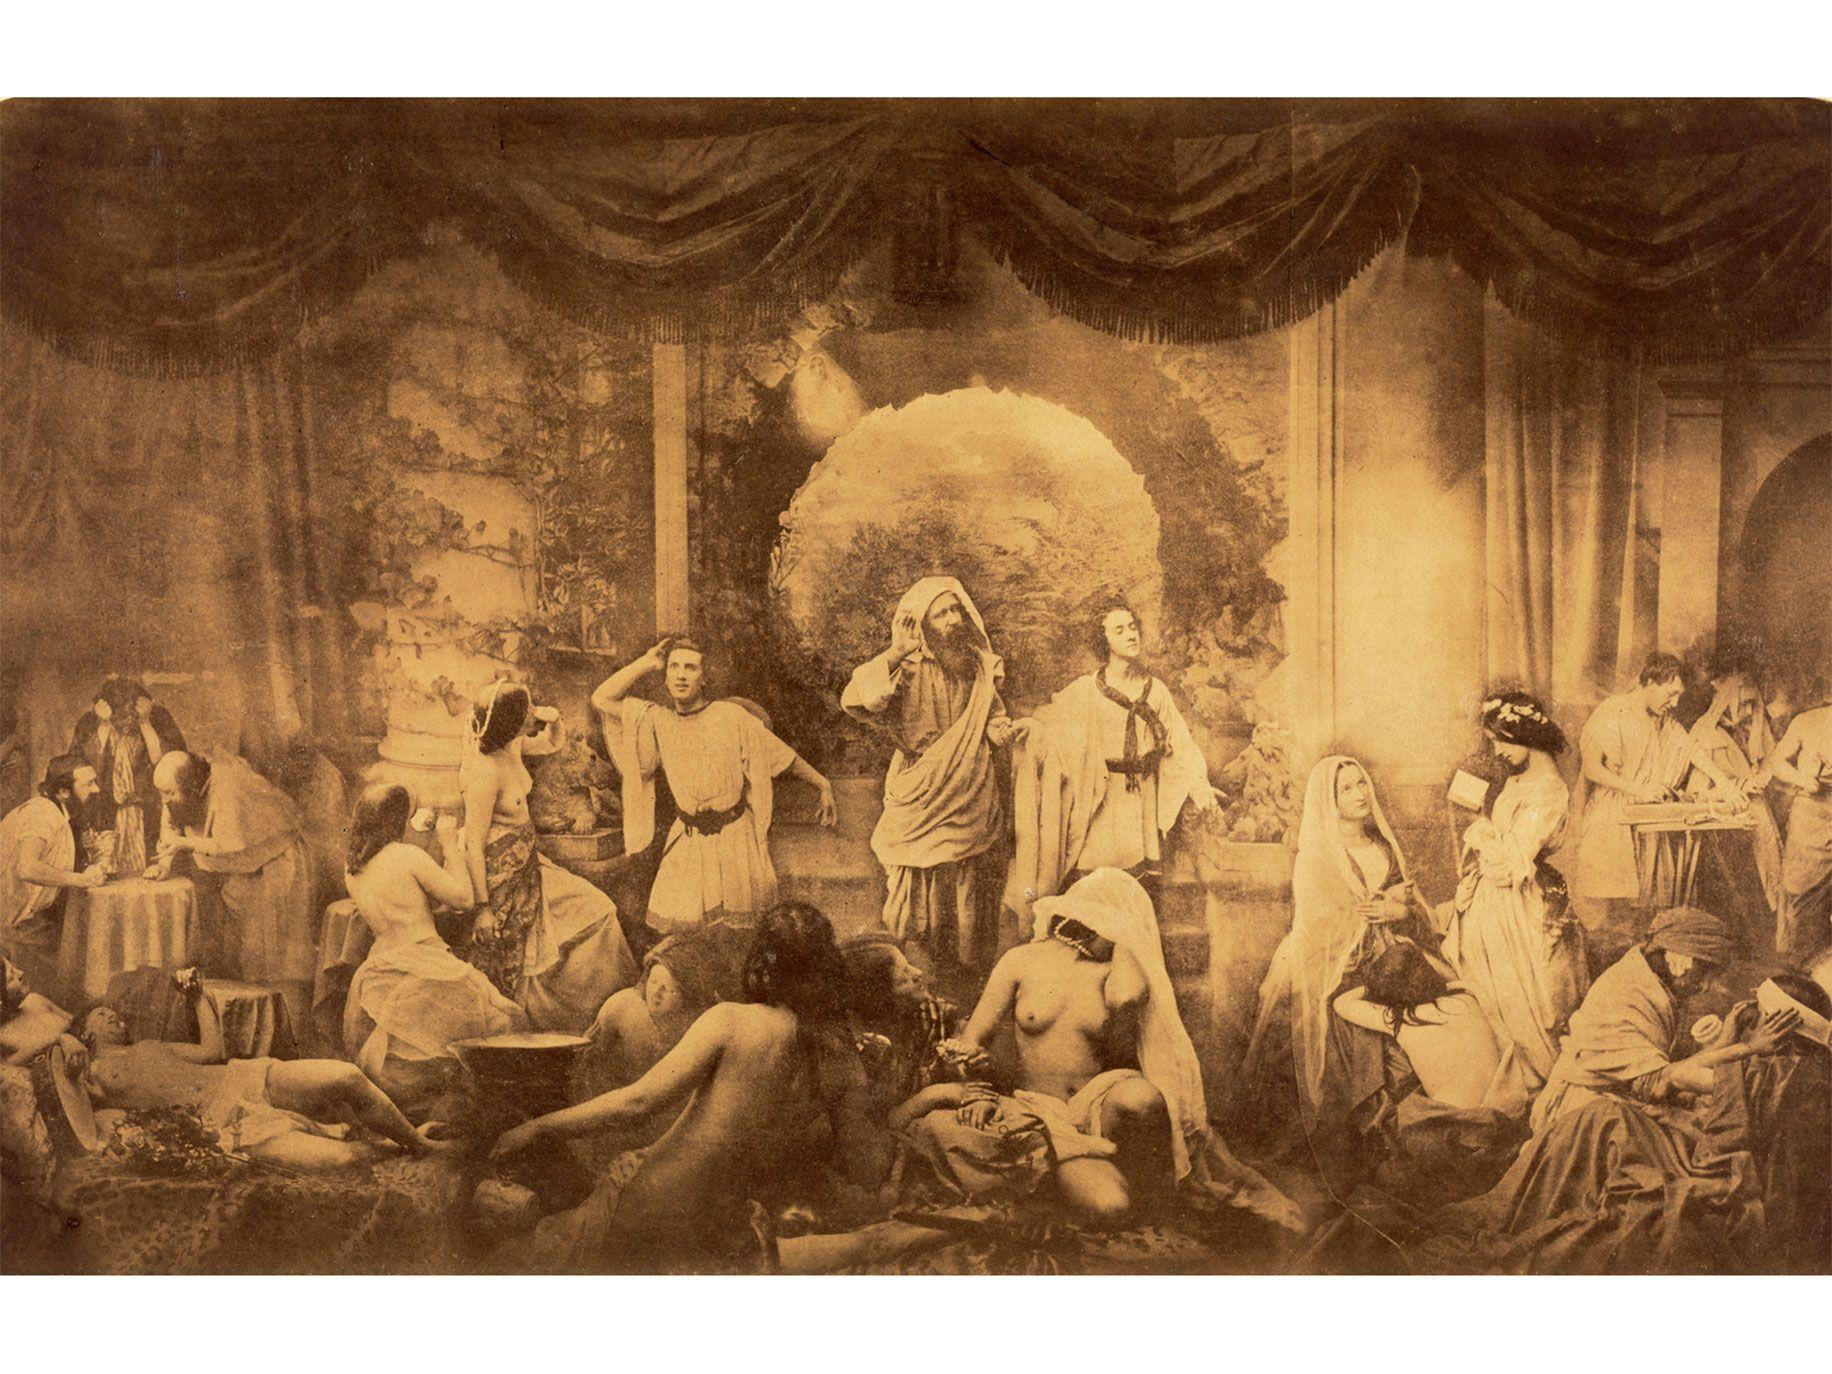 Two Ways of Life (1857), by Oscar Rejlander, albumen silver print.